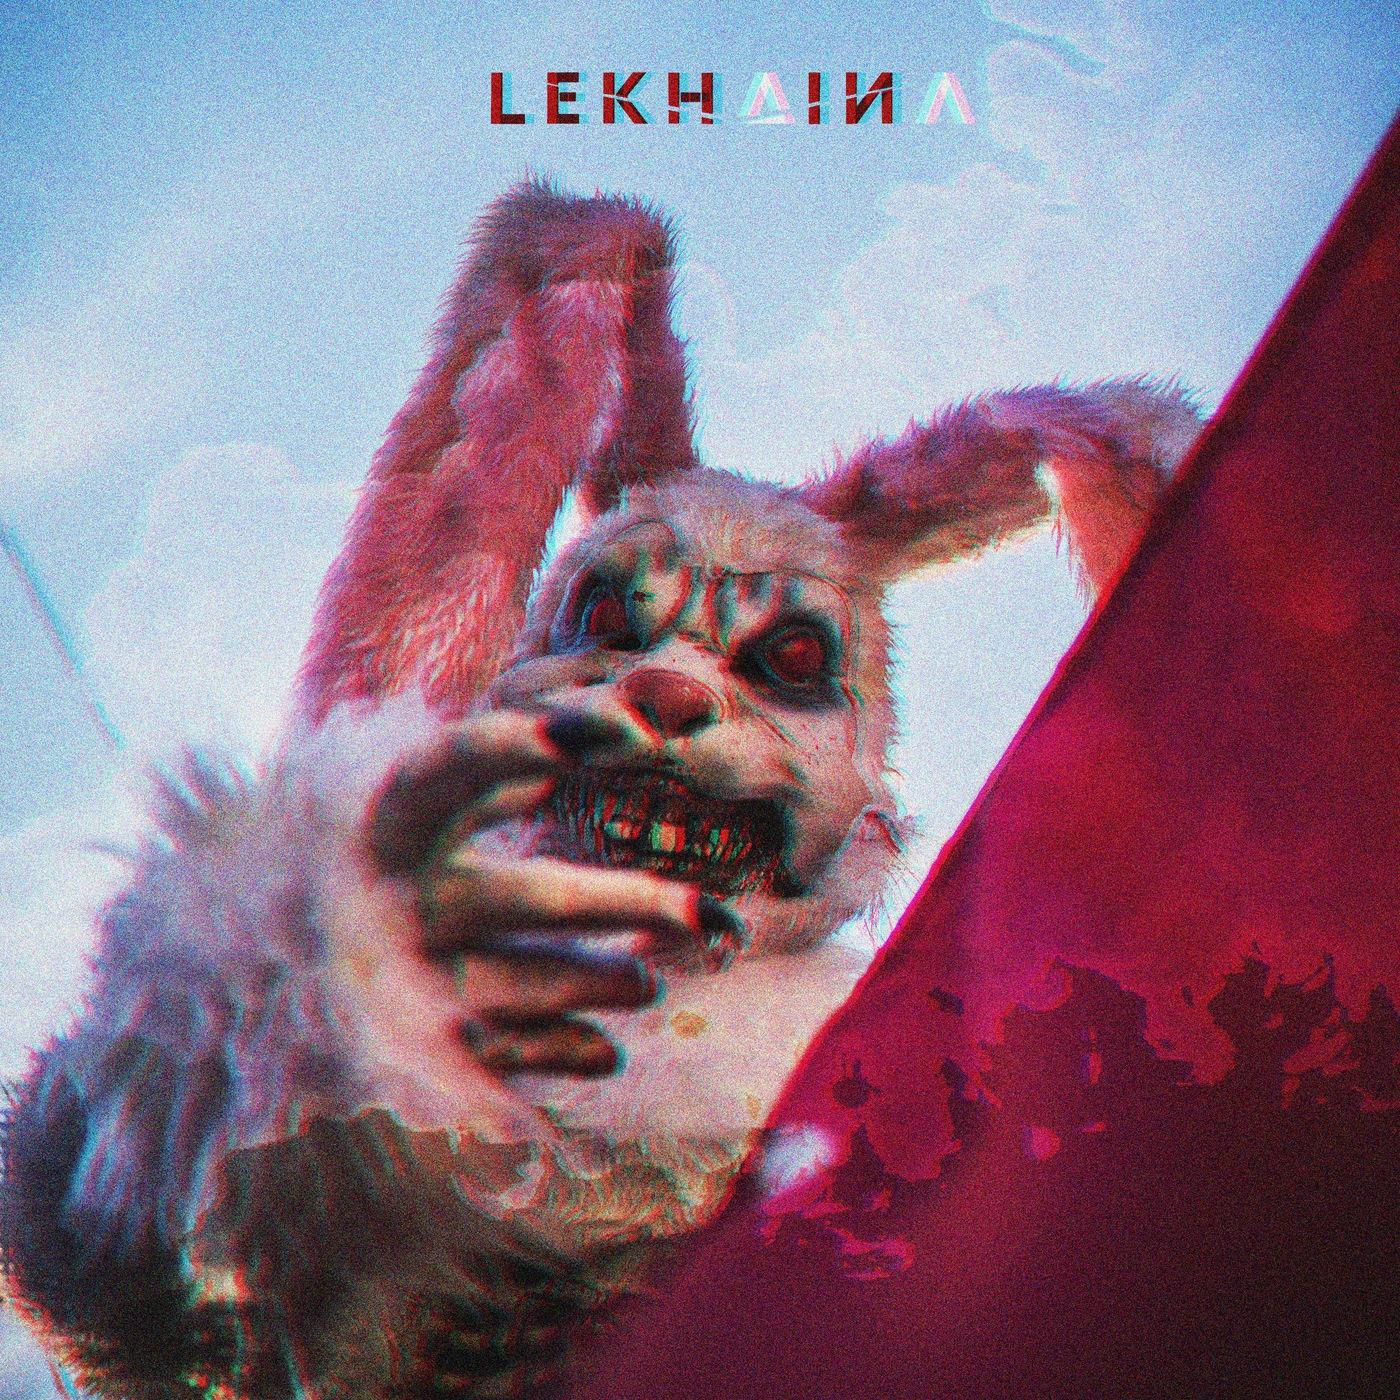 Lekhaina - Terror da Cena